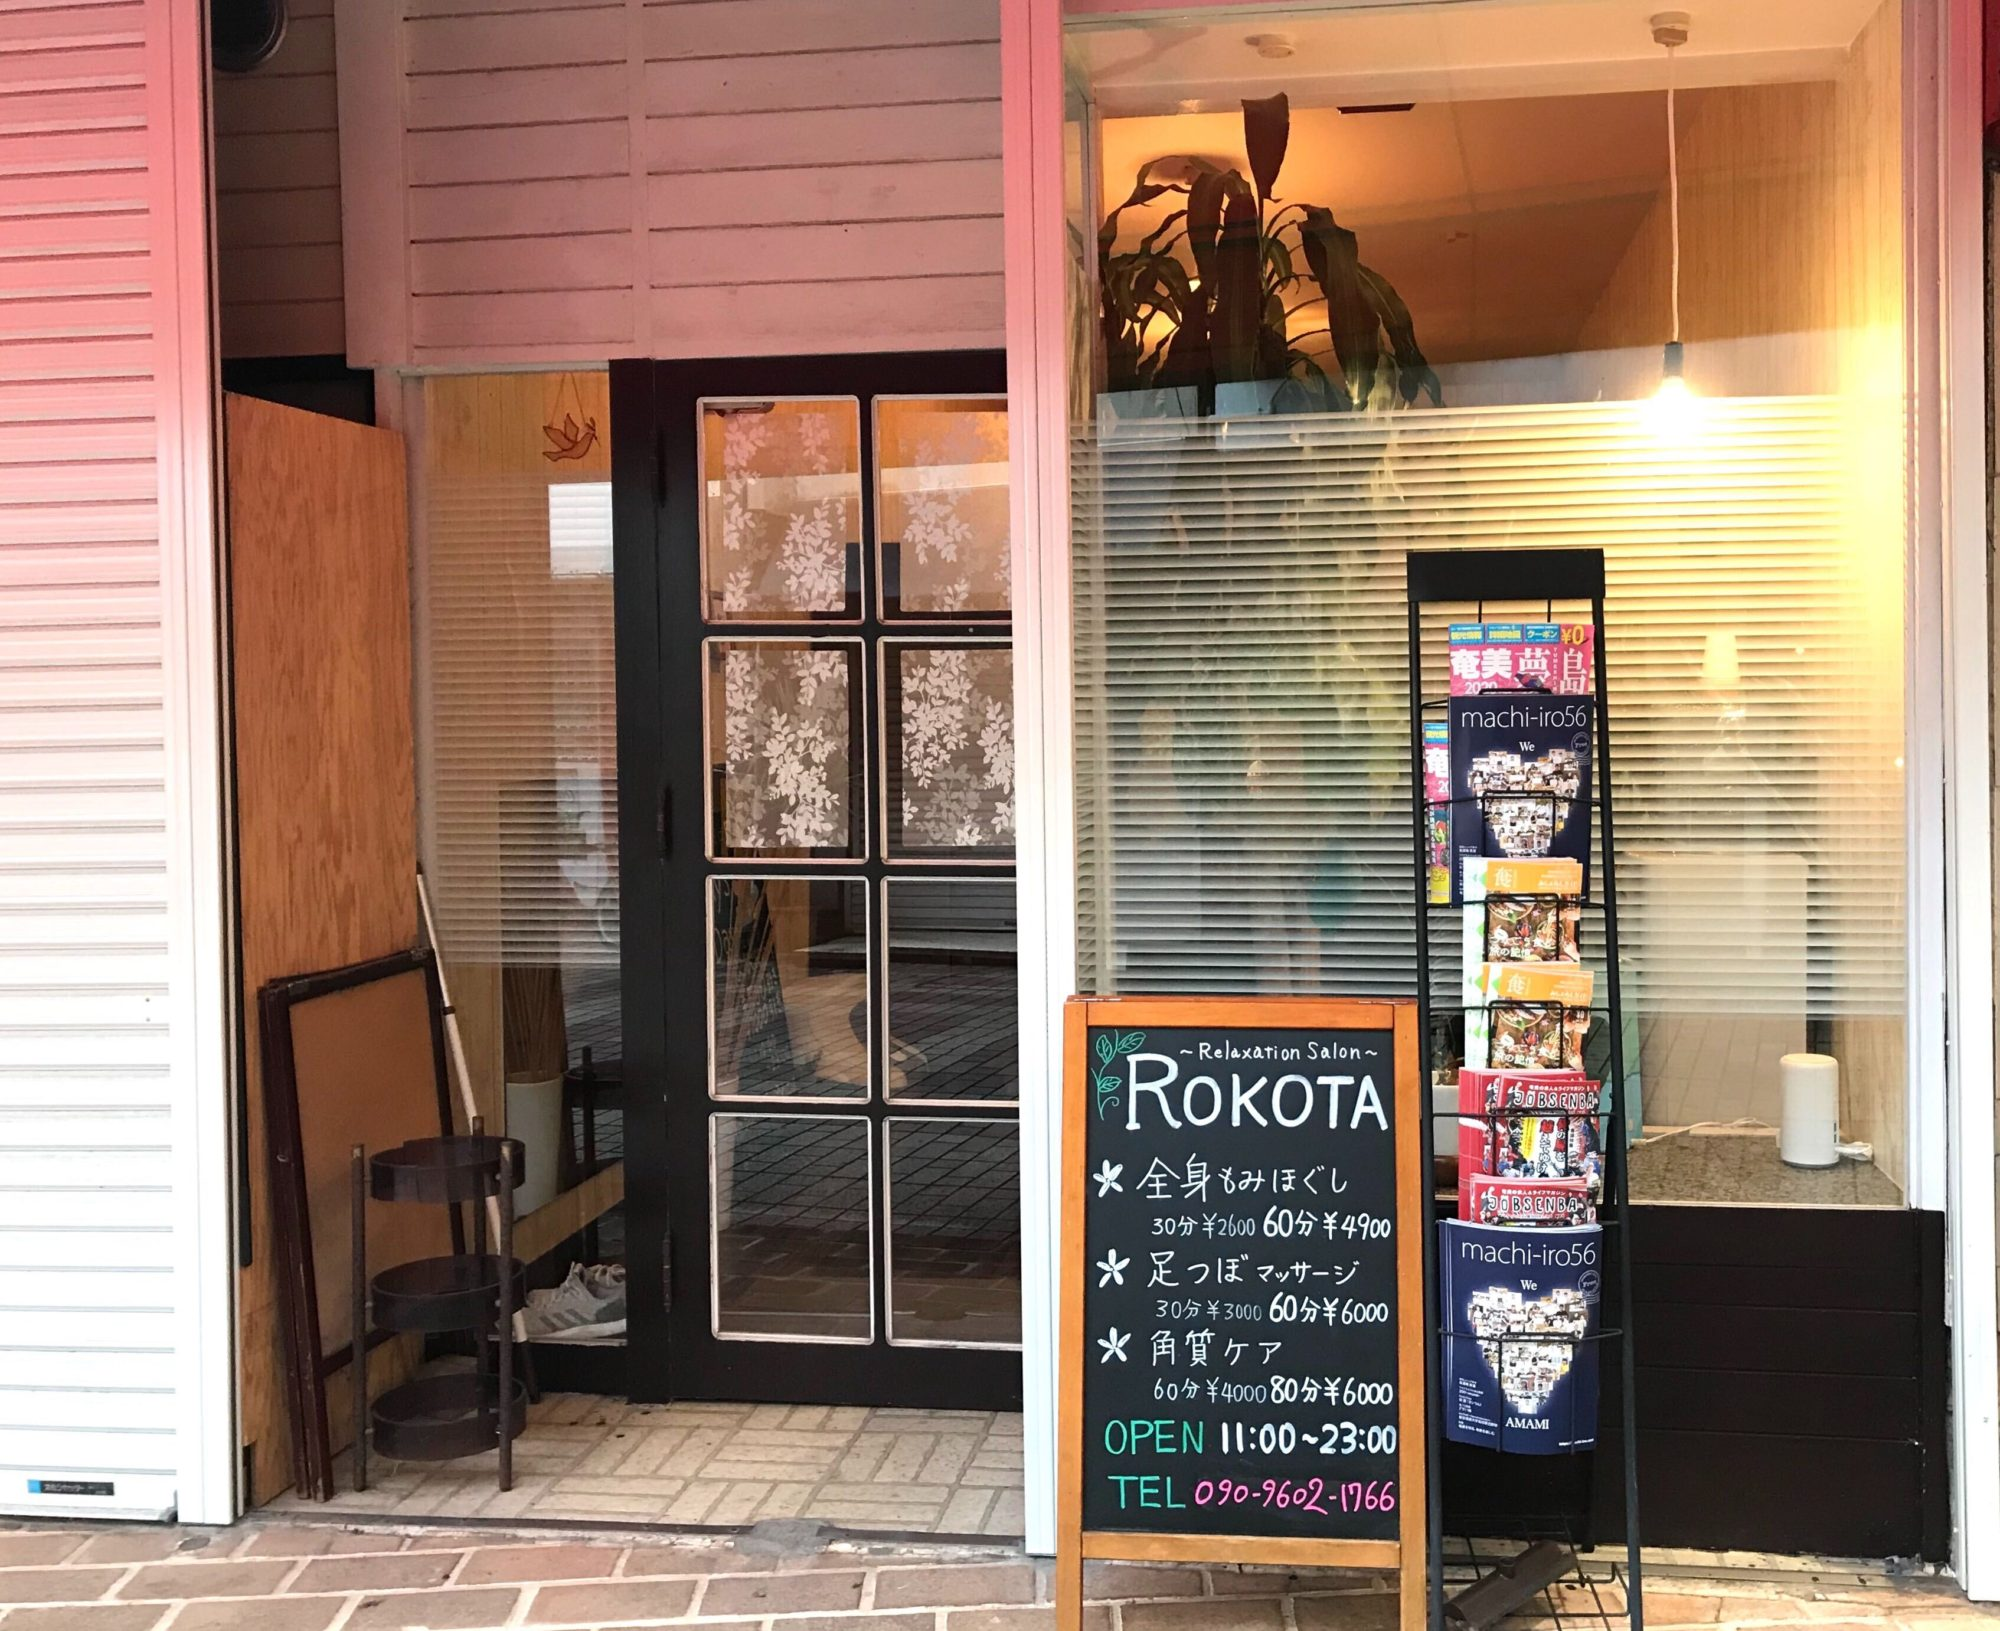 Rokota202008 6